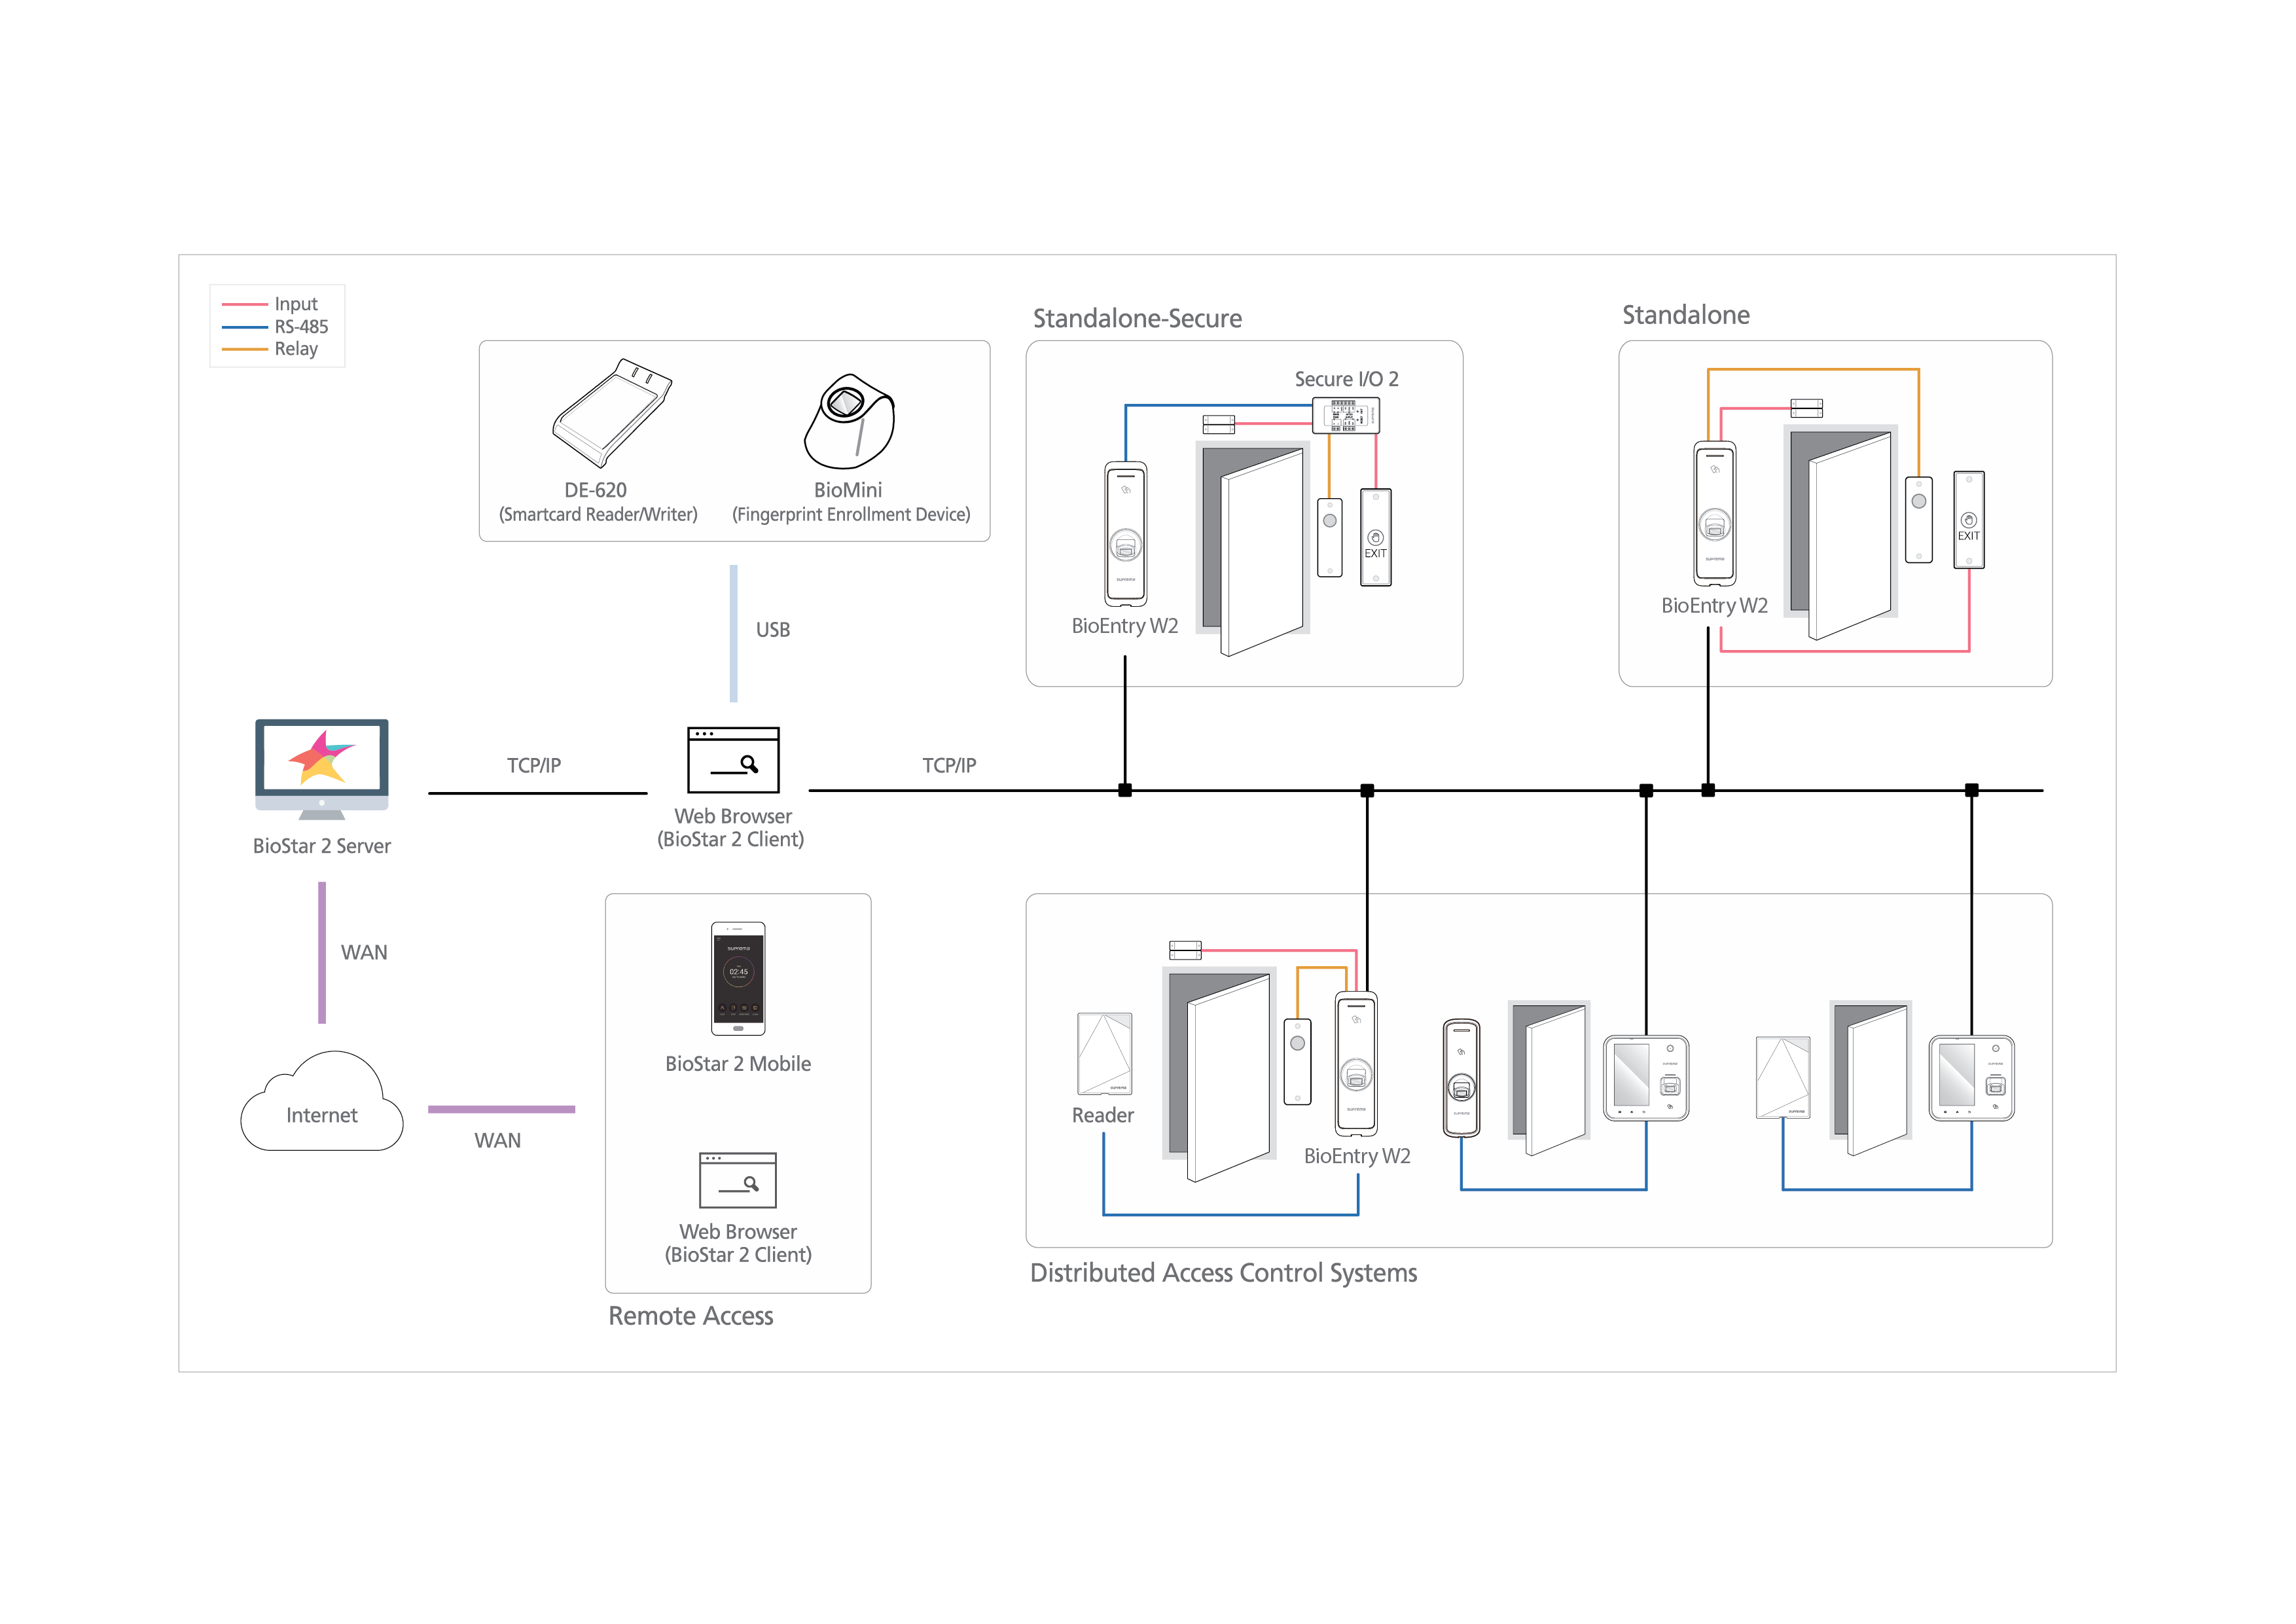 suprema bioentry plus wiring diagram inspirational bioentry w2